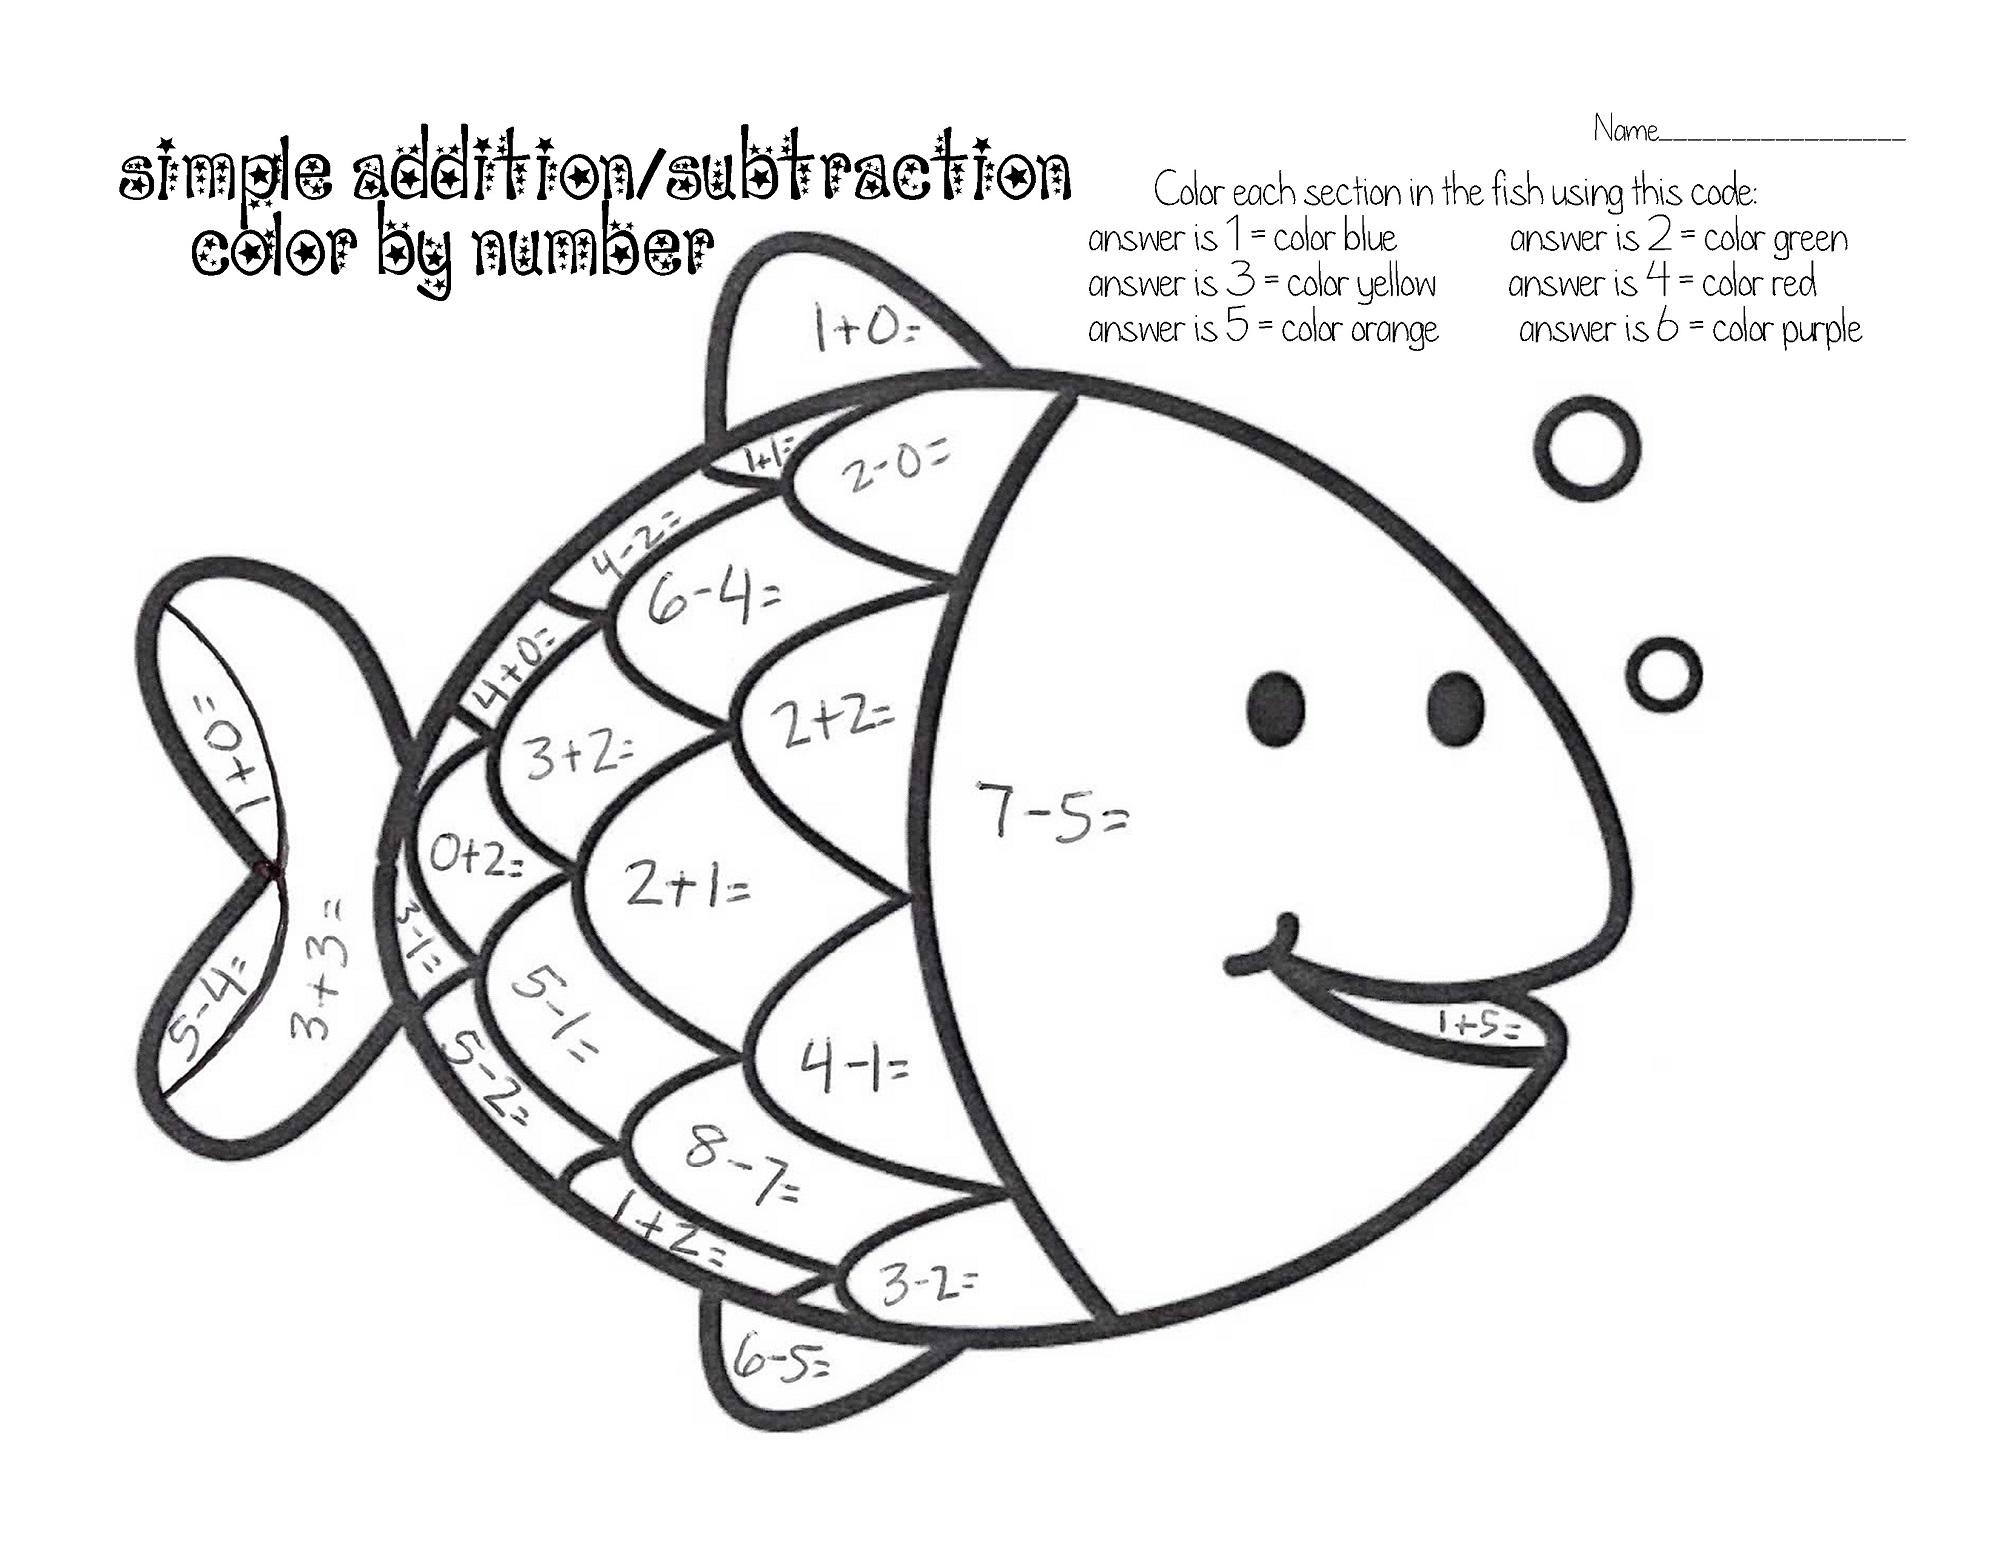 worksheet Easy Color By Number Worksheets easy fun fish worksheets for kids color by number learning printable number